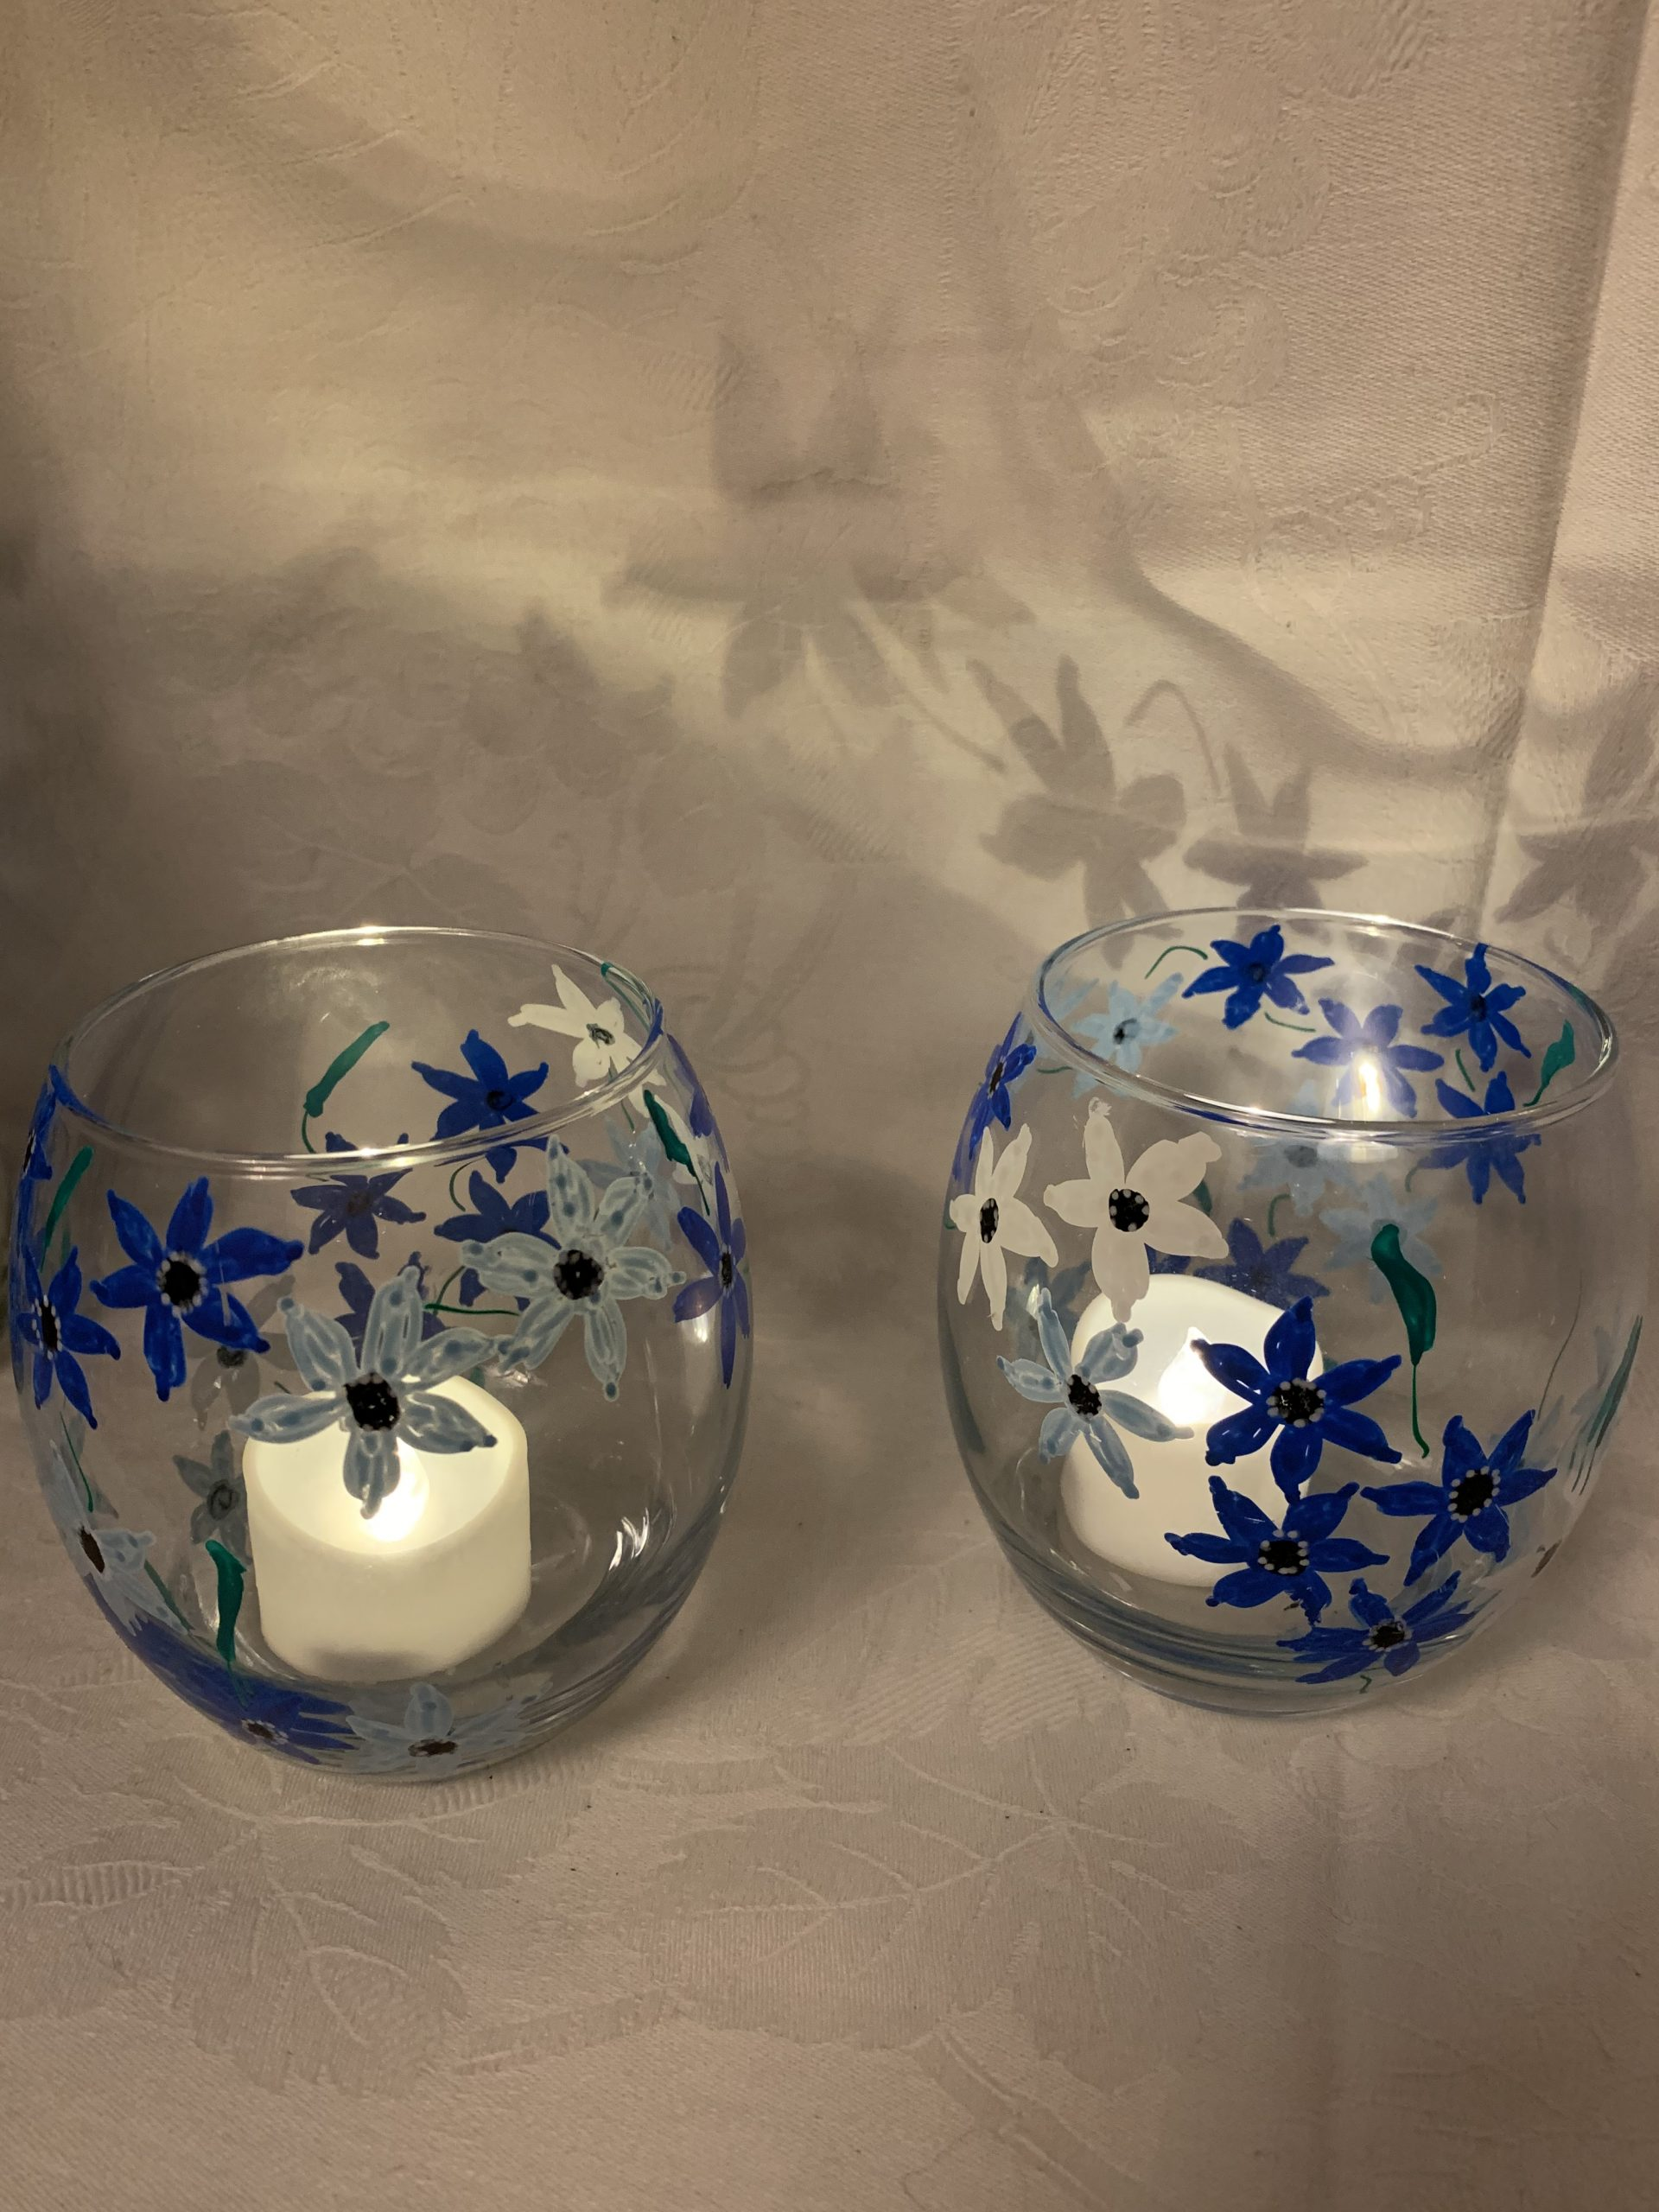 Tealight Blue Flowers £3 each £5 Pair